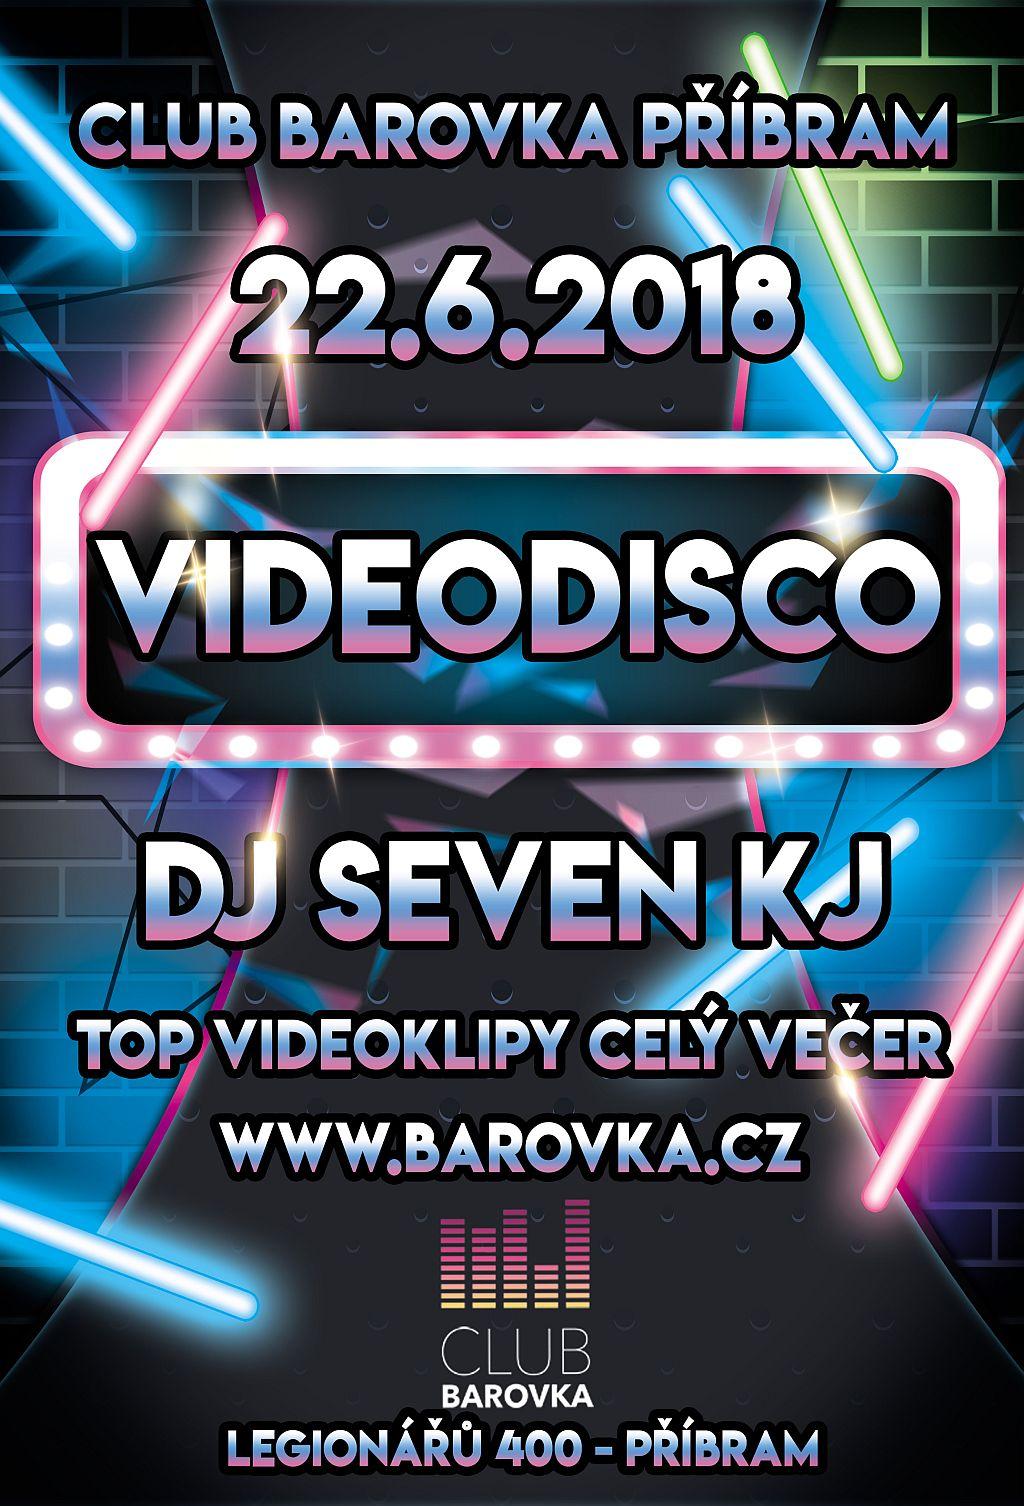 Dj Seven kj Videodisco Příbram